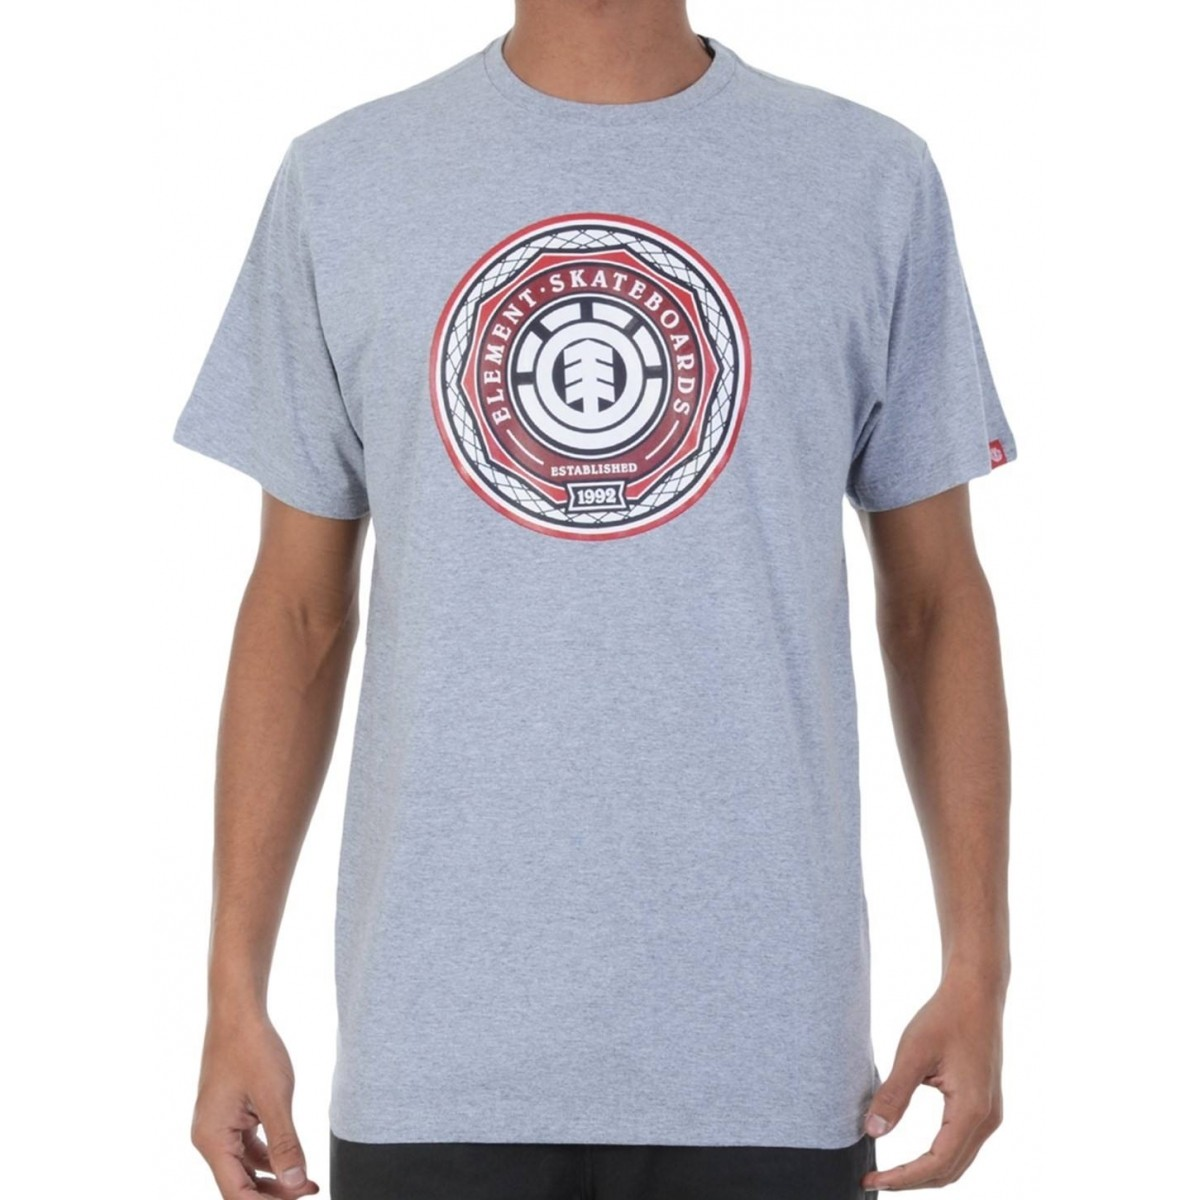 camiseta - Busca na Loja Virtual Soul Beach! As melhores marcas ... 549095d237d